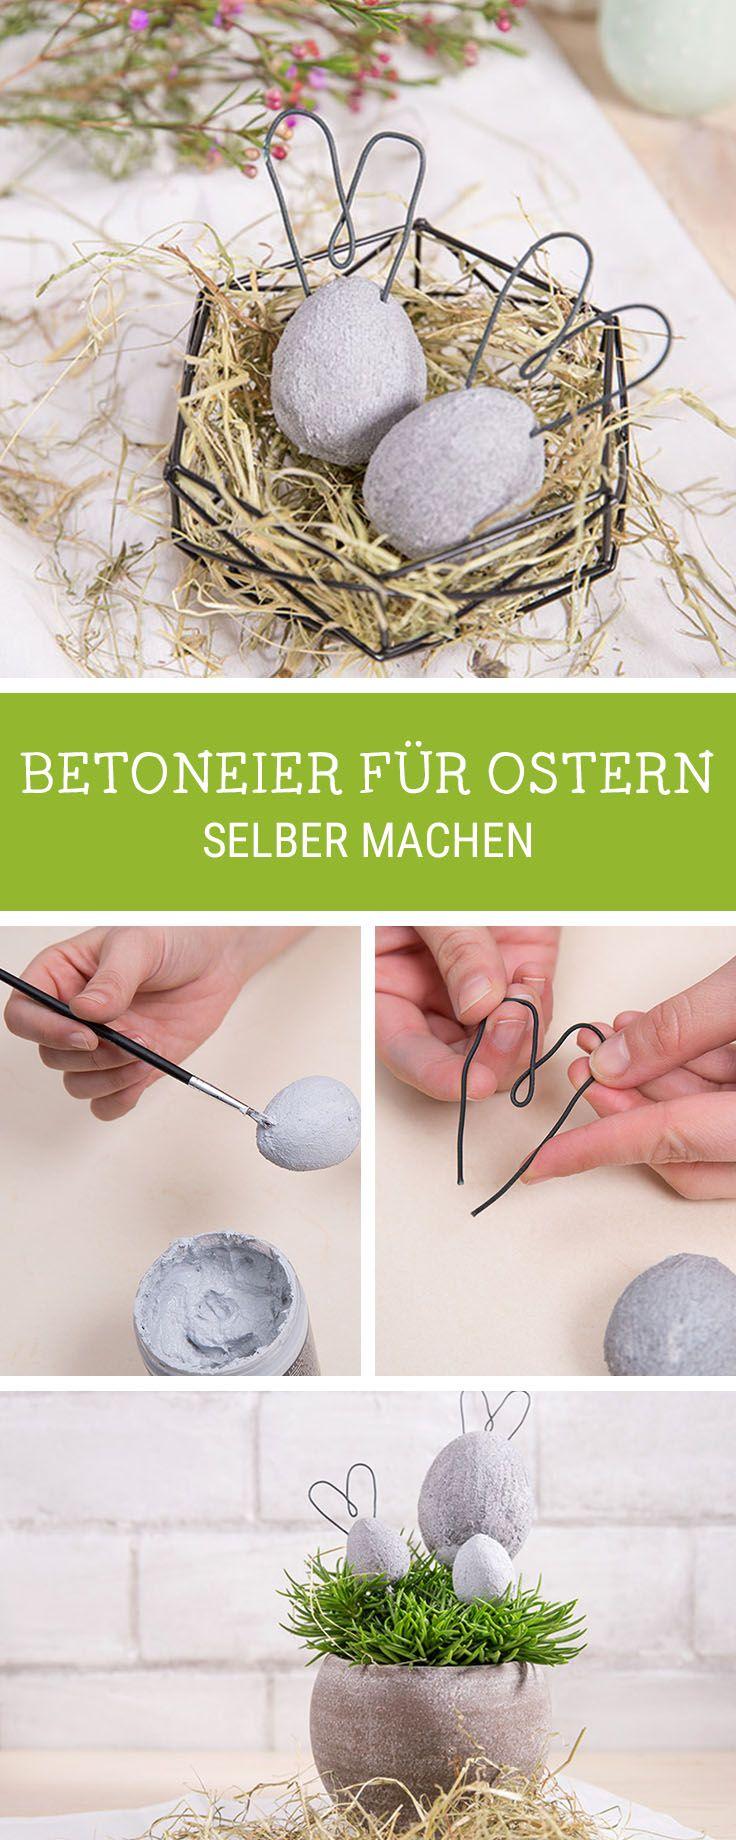 DIY-Anleitung für Ostereier aus Beton mit Hasenohren, Osterdeko selbermachen / craft Easter decoration: concrete Easter eggs with bunny ears via DaWanda.com